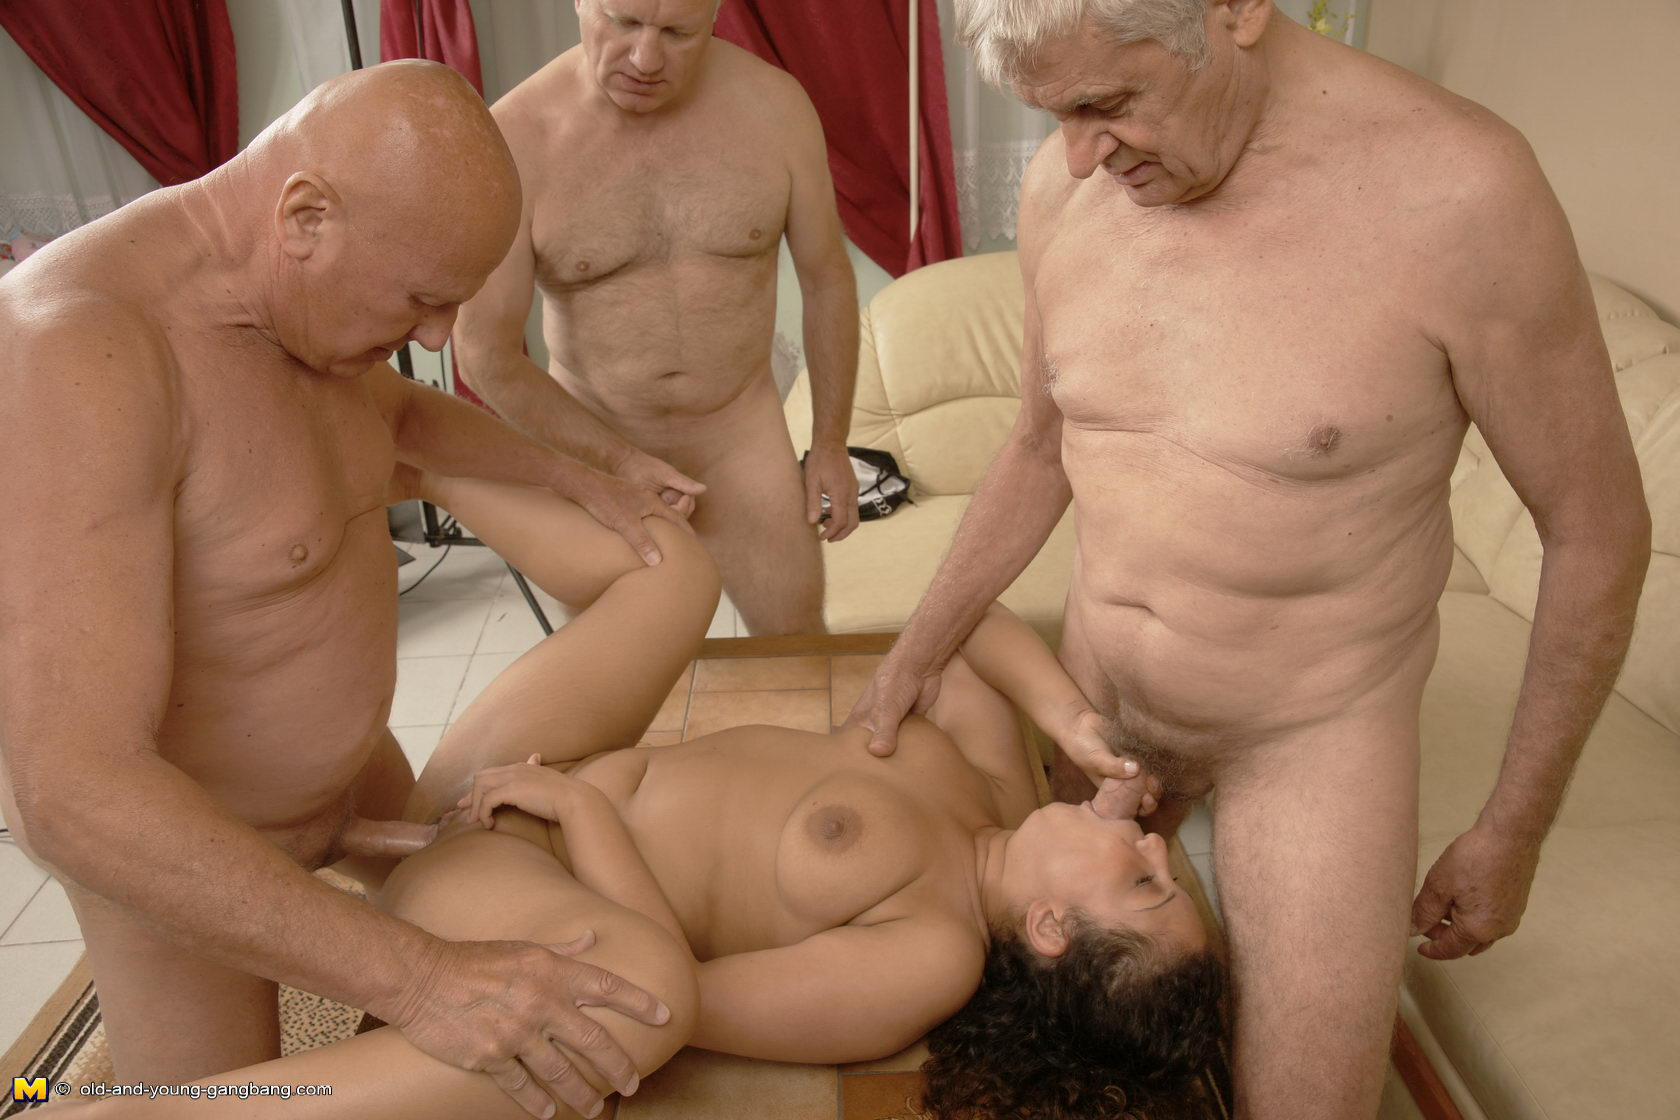 Old Men Gangbang Mature Porno old men young girl gangbang porn excelent porn   free hot